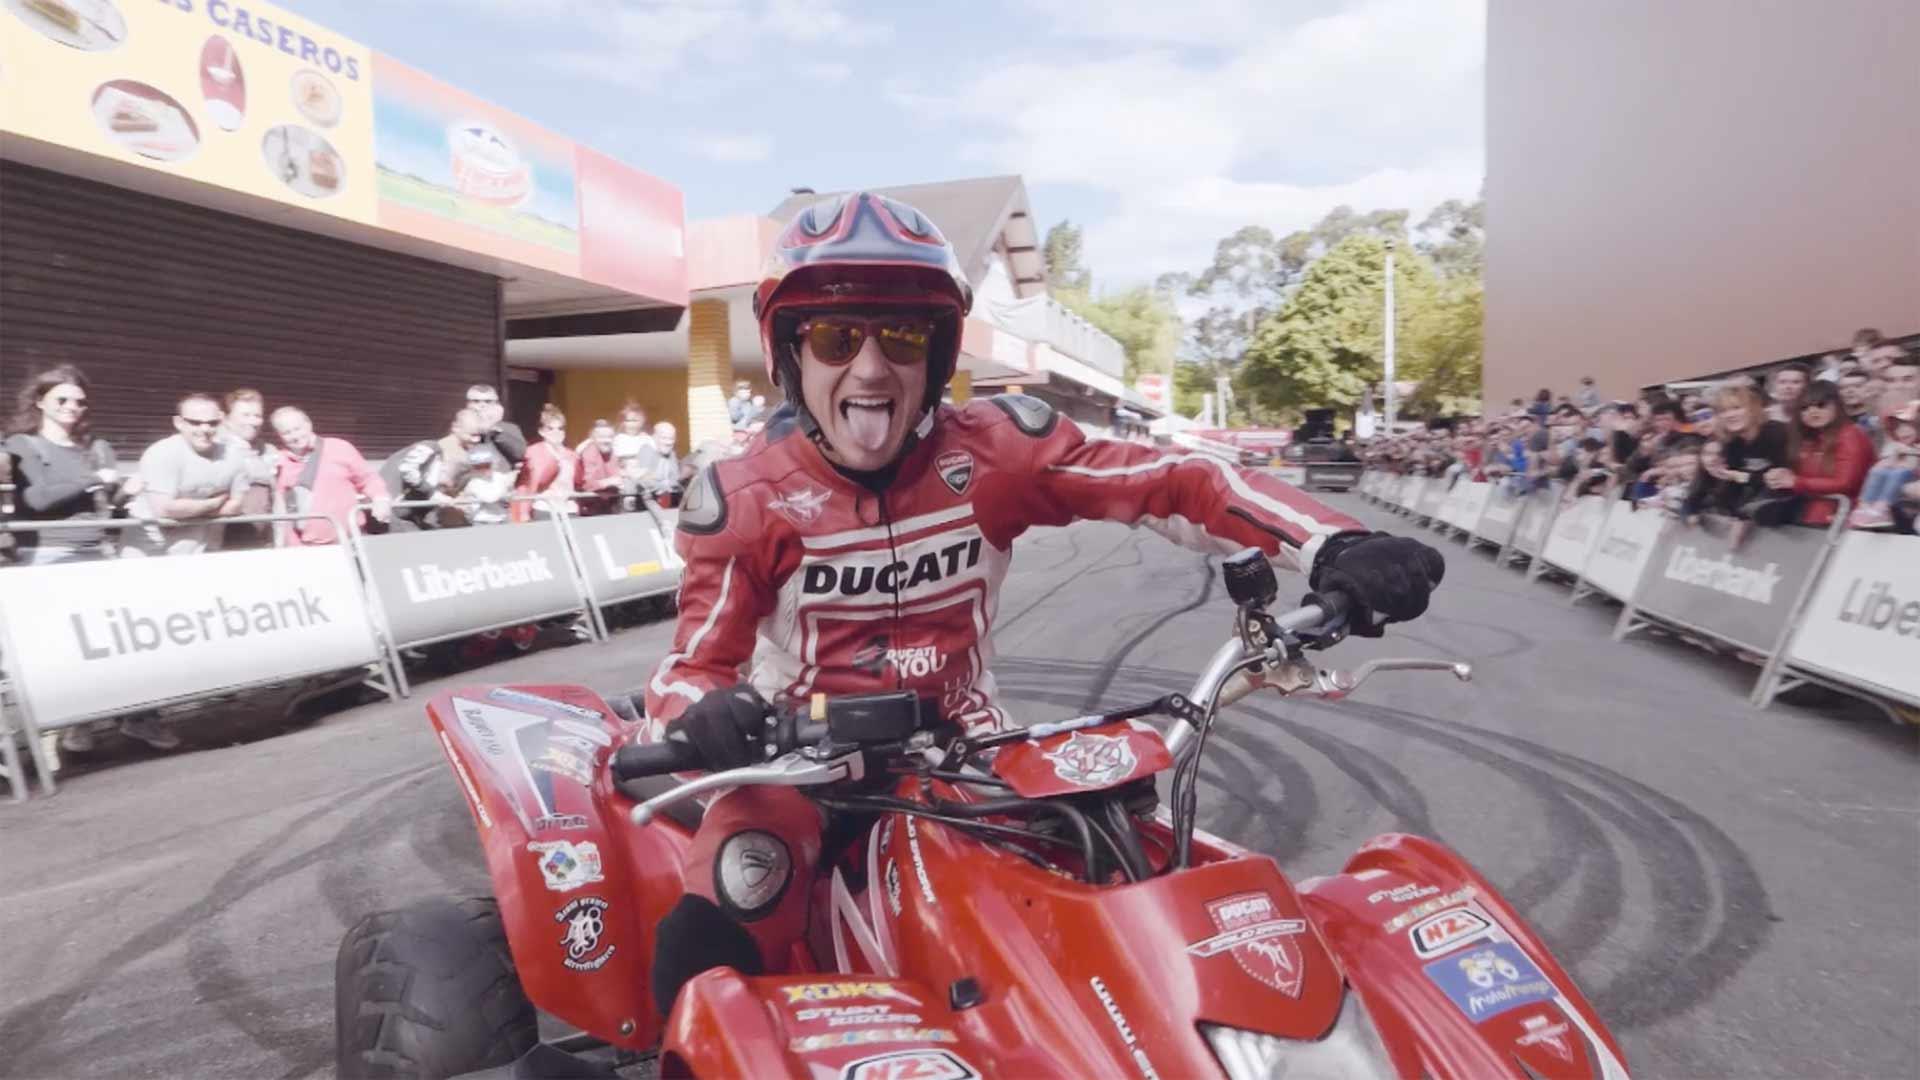 Imagen del festival de motos motoweekend gijon